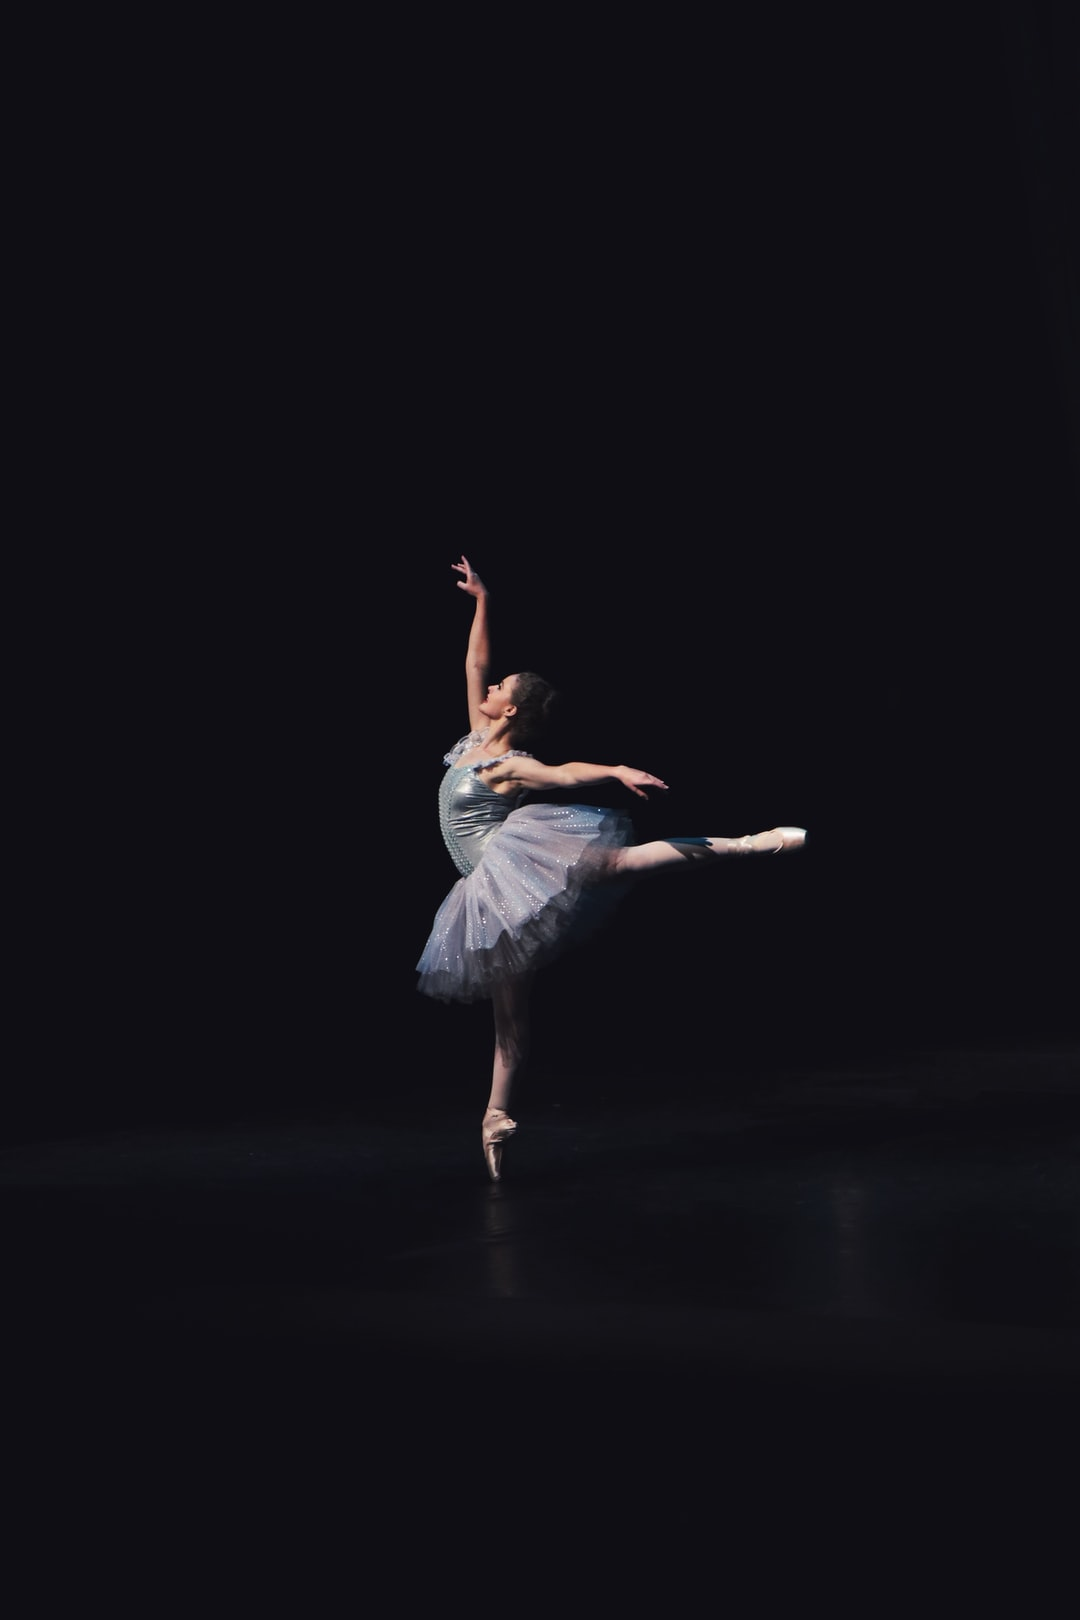 photography of u003cbu003edancingu003c/bu003e ballerina photo u2013 Free u003cbu003eDanceu003c/bu003e Image on ...